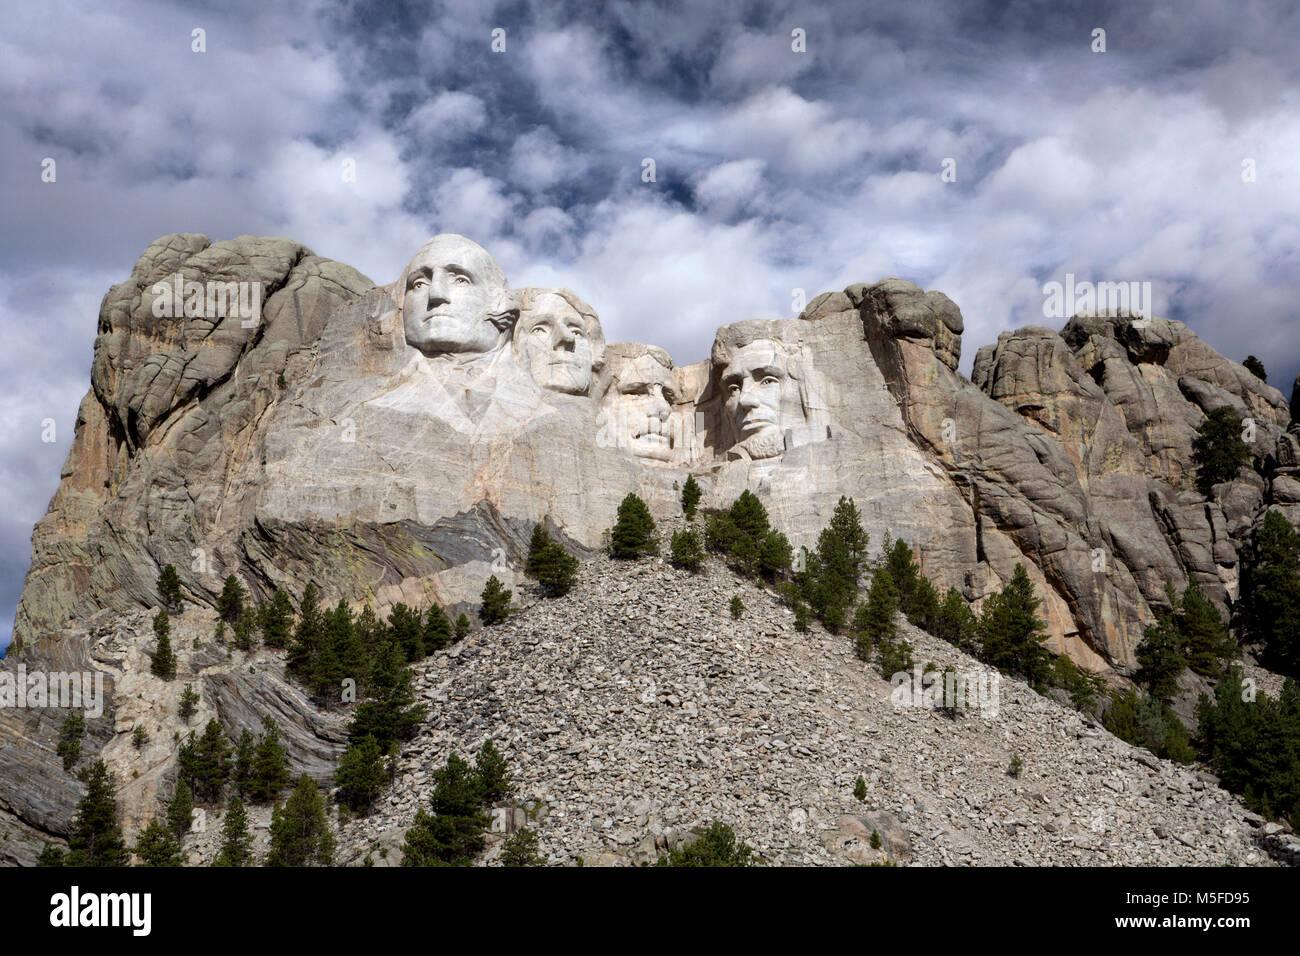 SD00027-00...SOUTH DAKOTA - Presedents Georg Washington, Thomas Jefferson, Theodore Roosevelt and Abraham Lincoln - Stock Image